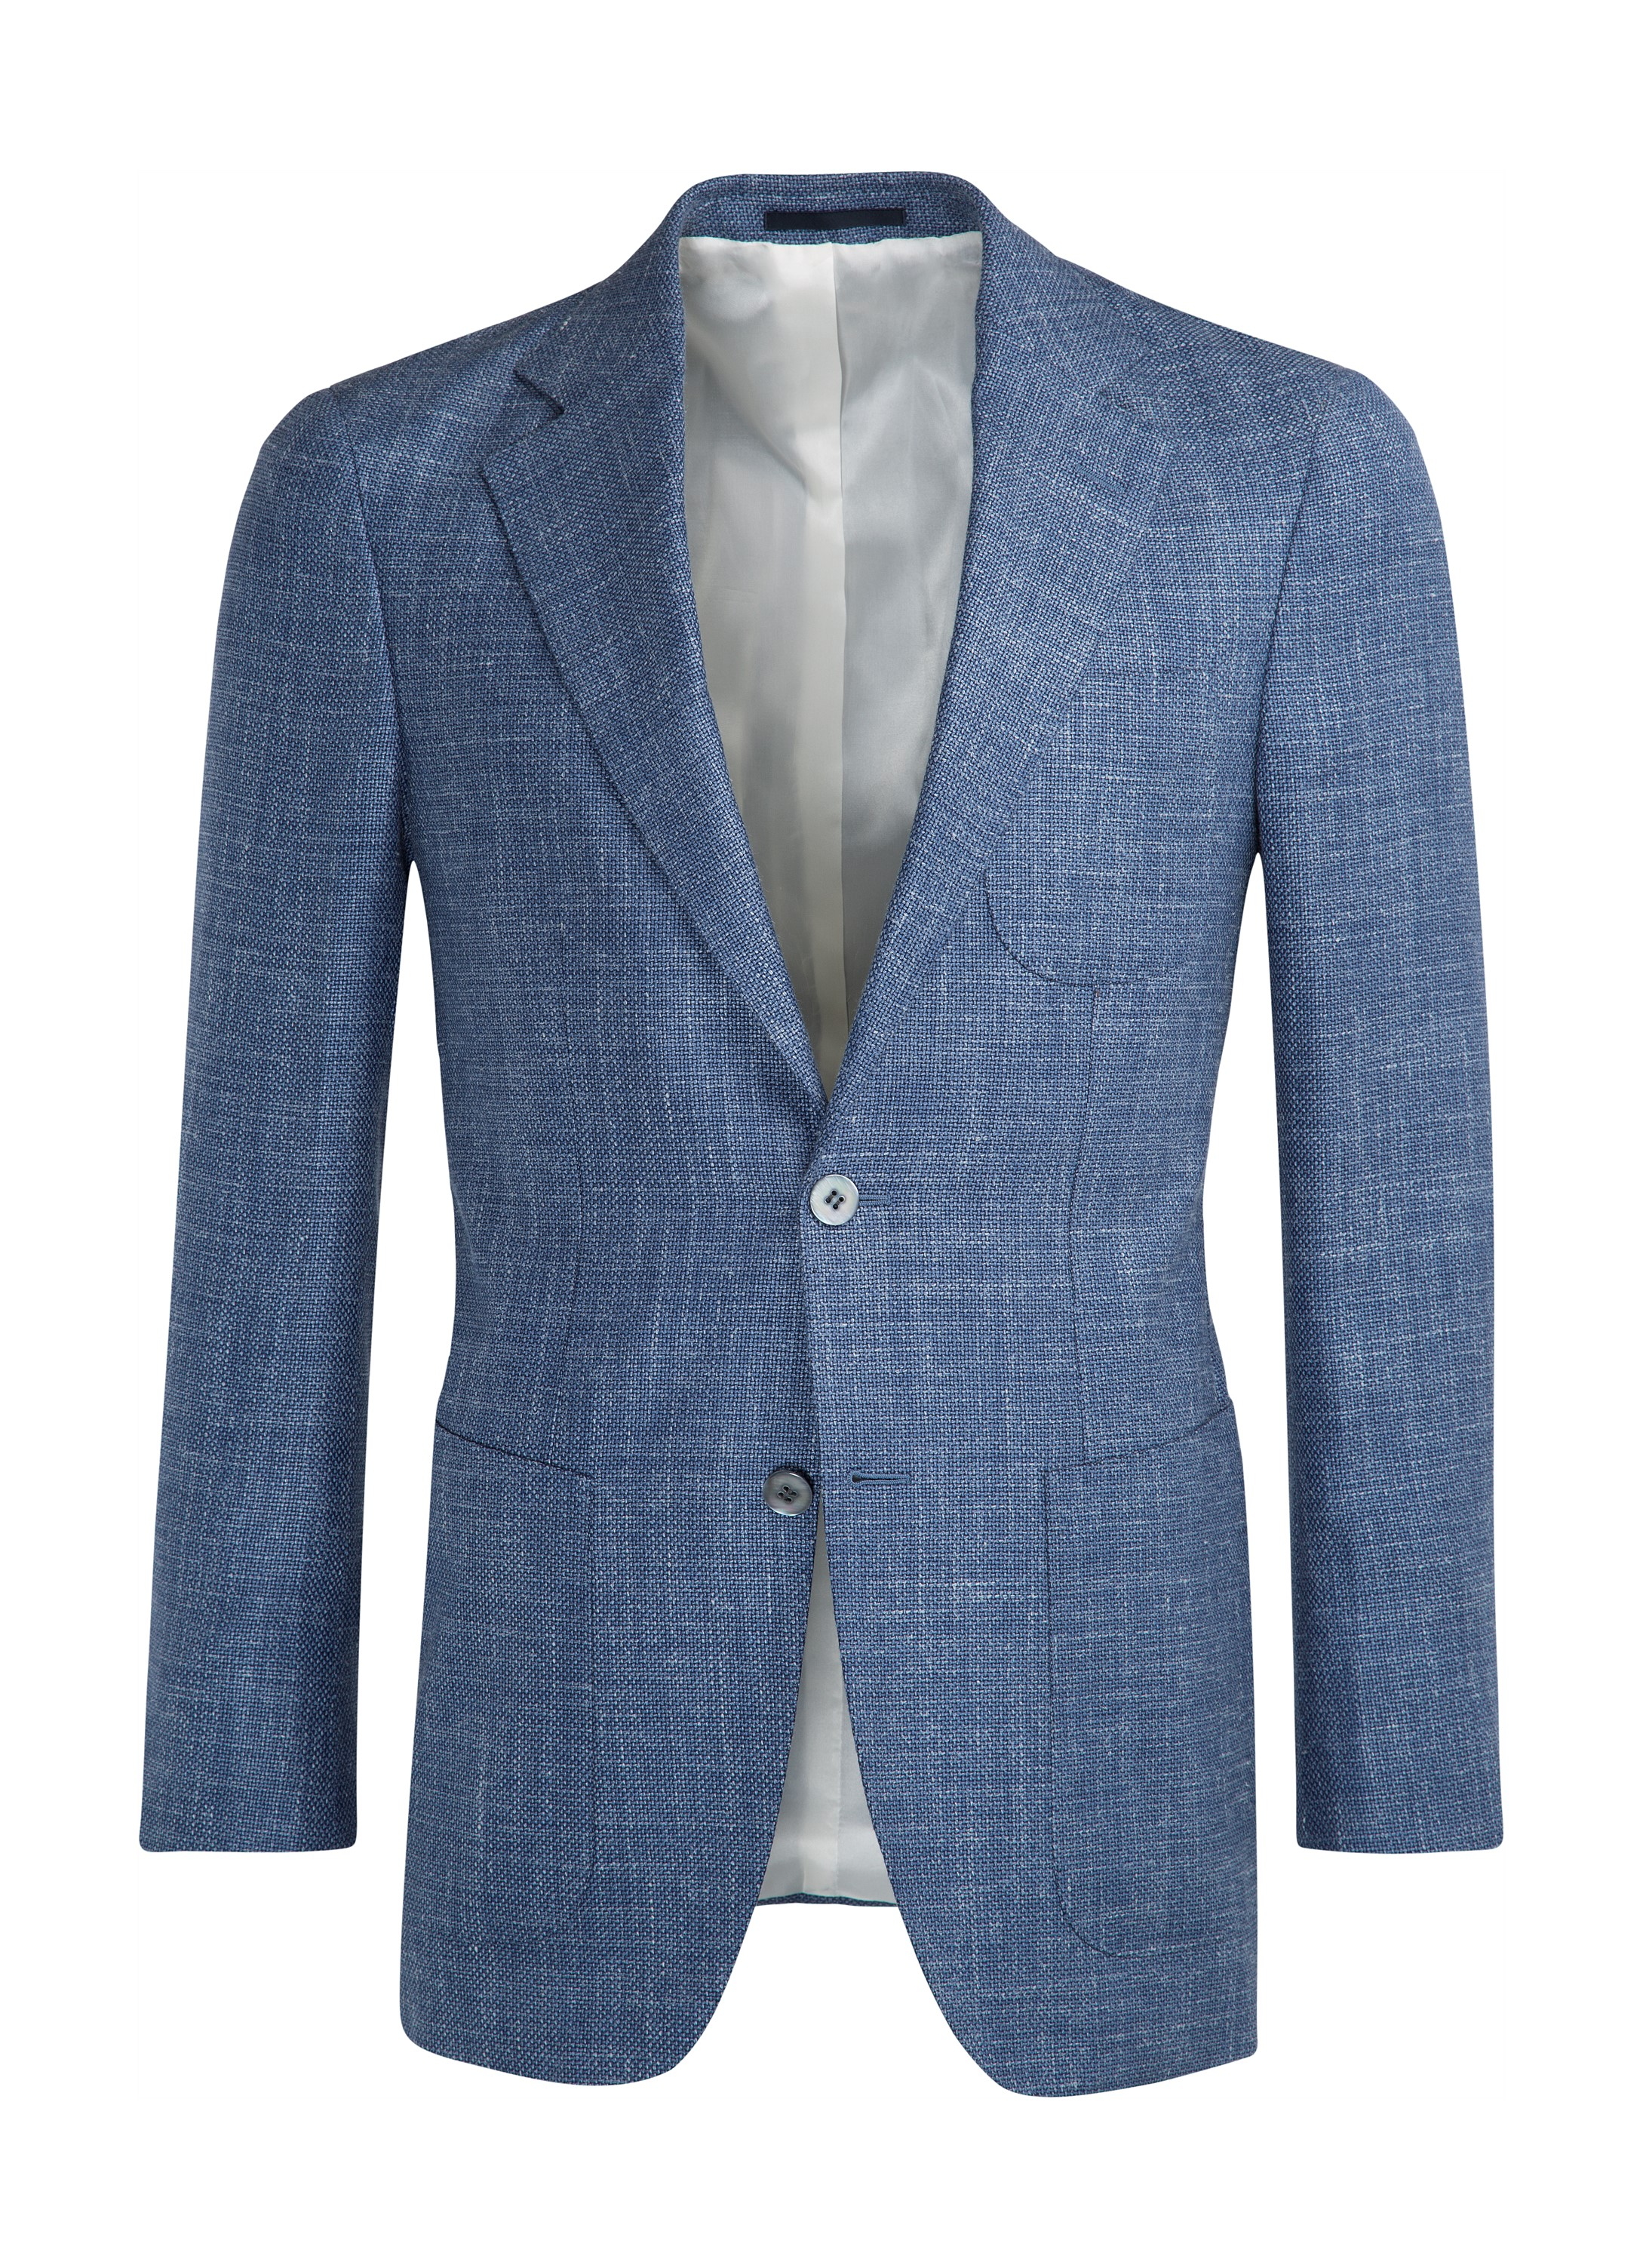 Jackets_Blue_Plain_Hudson_C838_Suitsupply_Online_Store_5.jpg